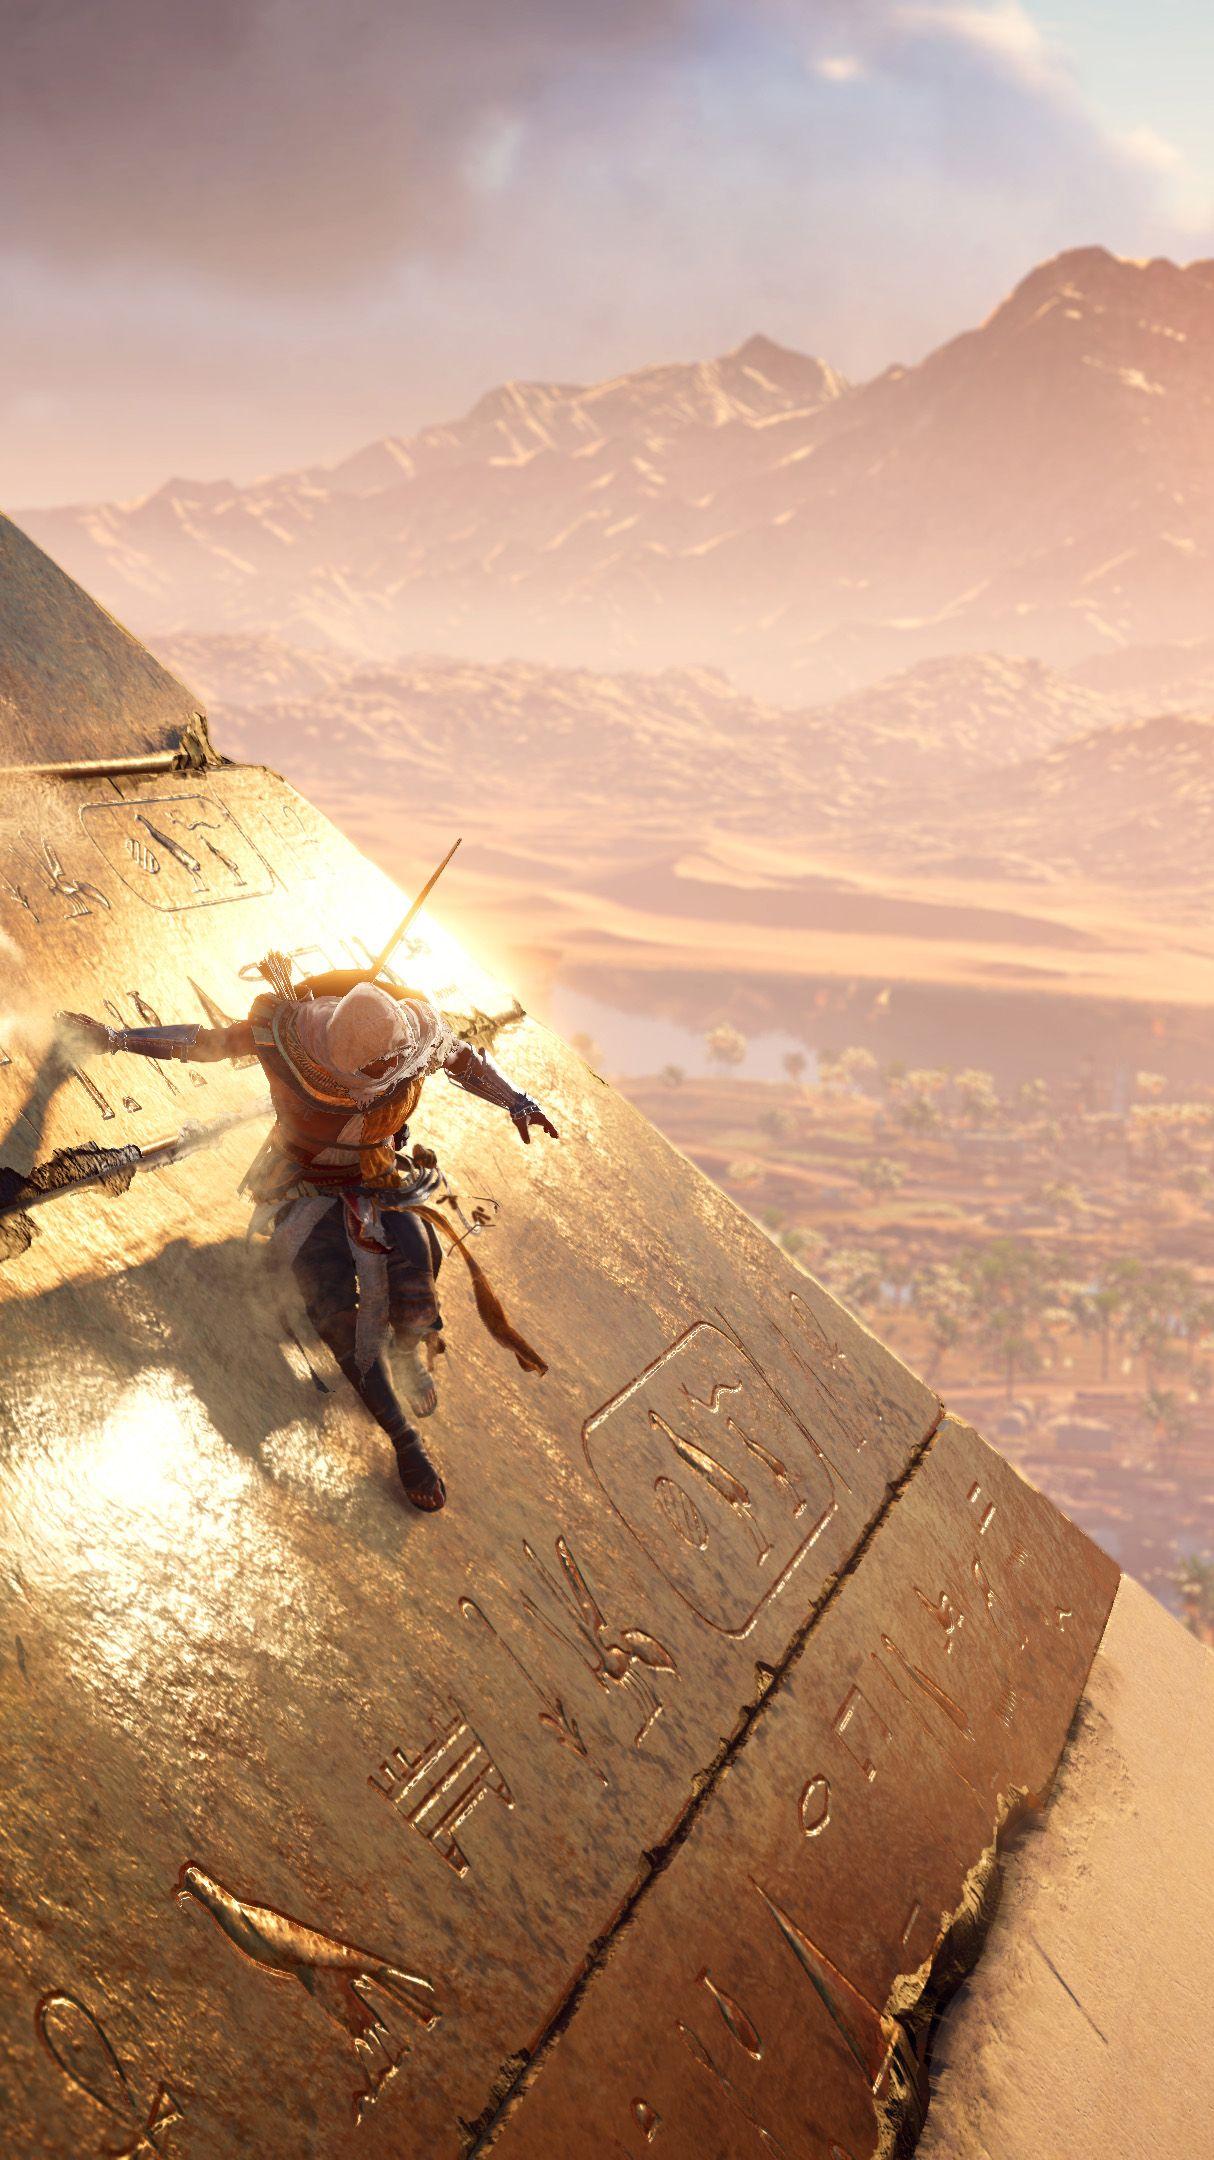 Bayek Assassin S Creed Origins Assassins Creed The Assassin Jeux Video Arts